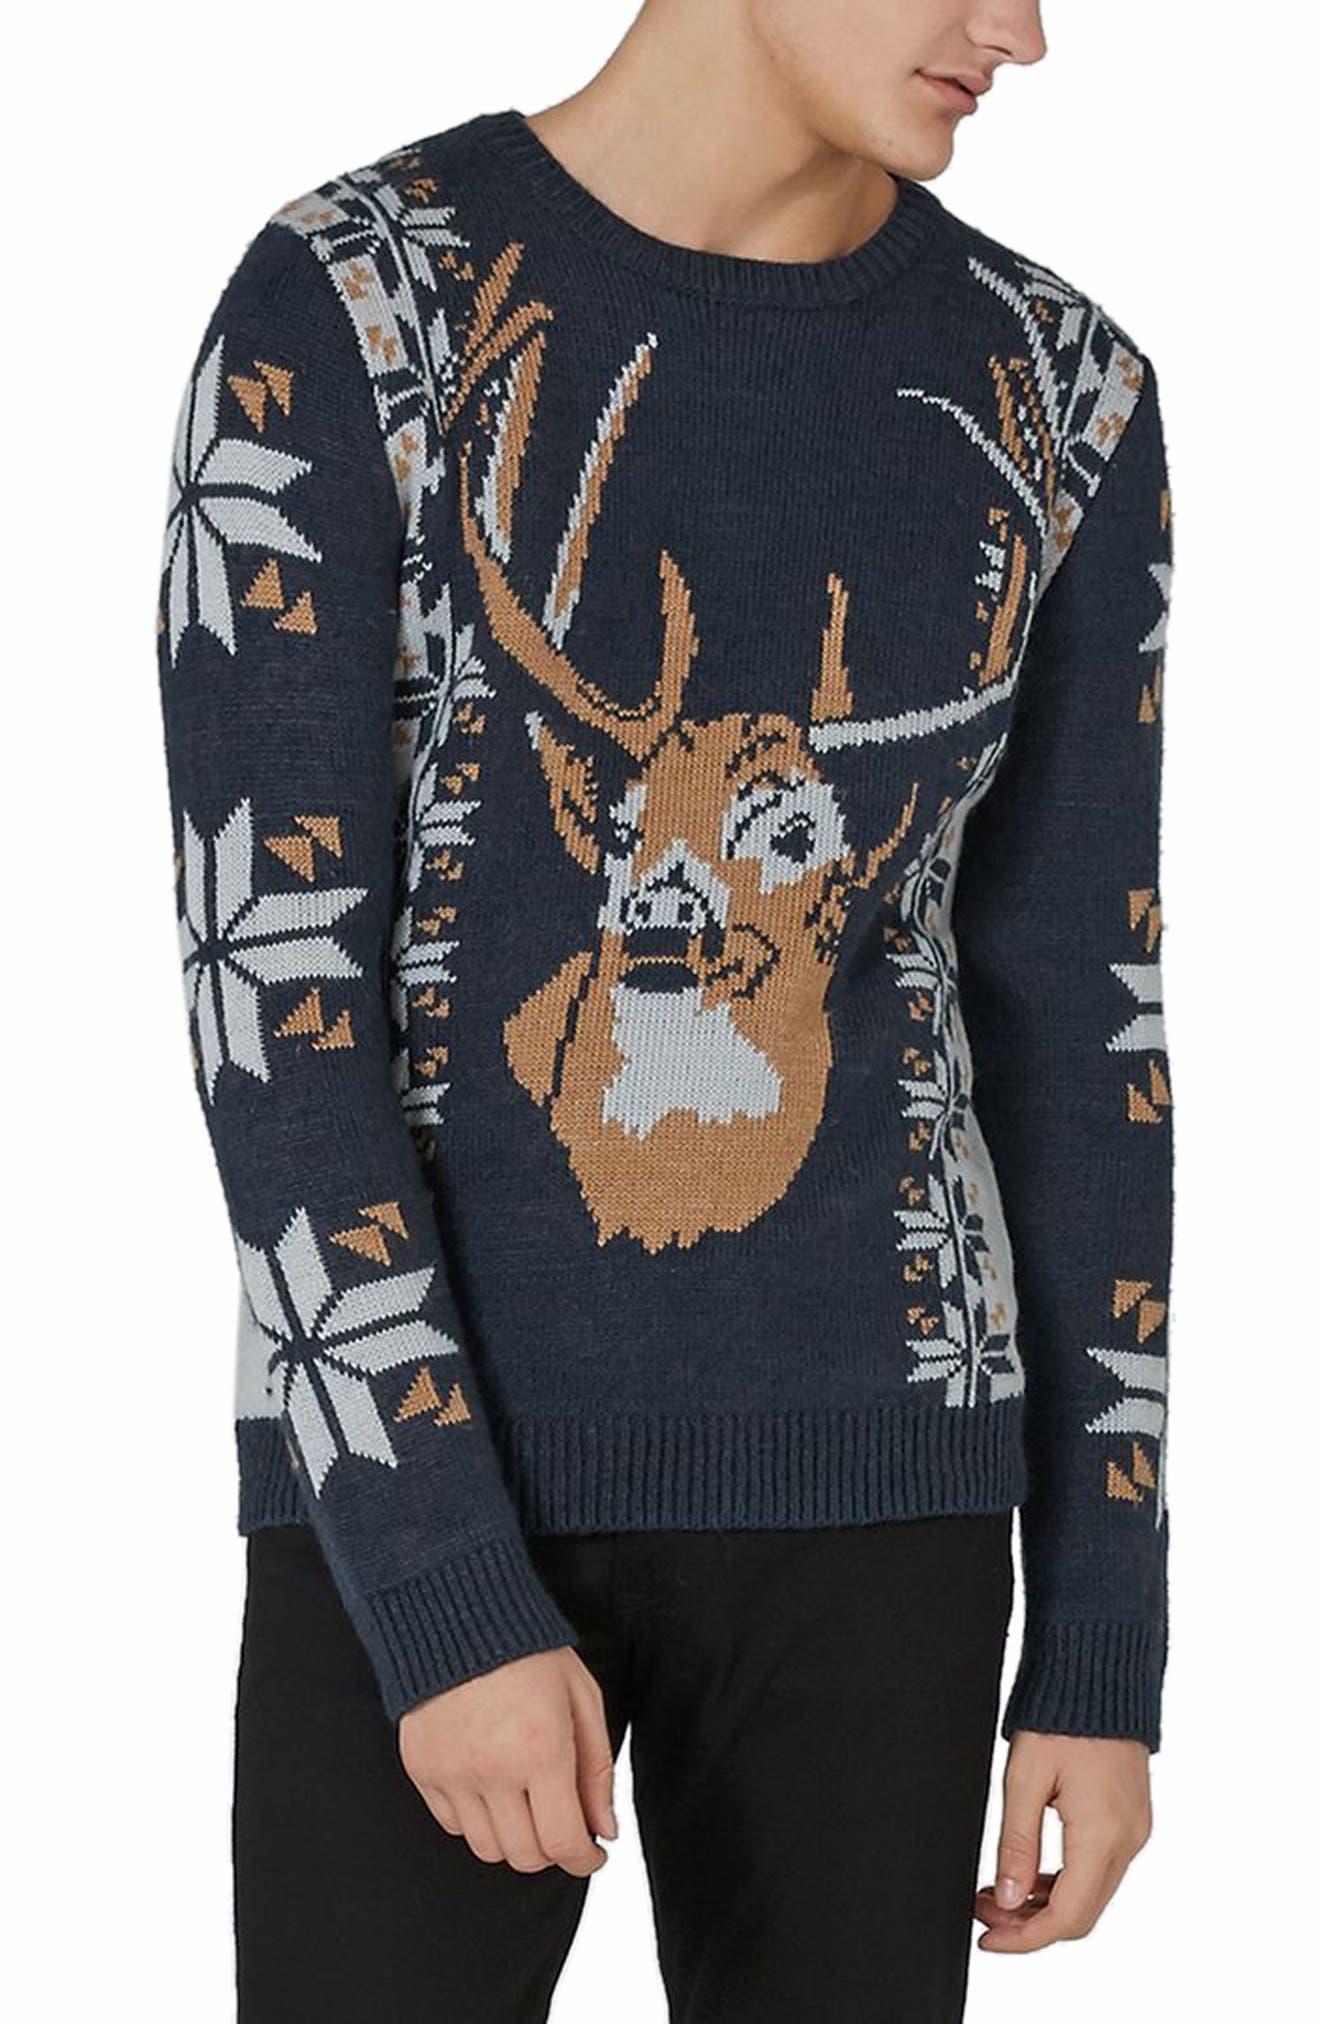 Topman Vintage Stag Sweater